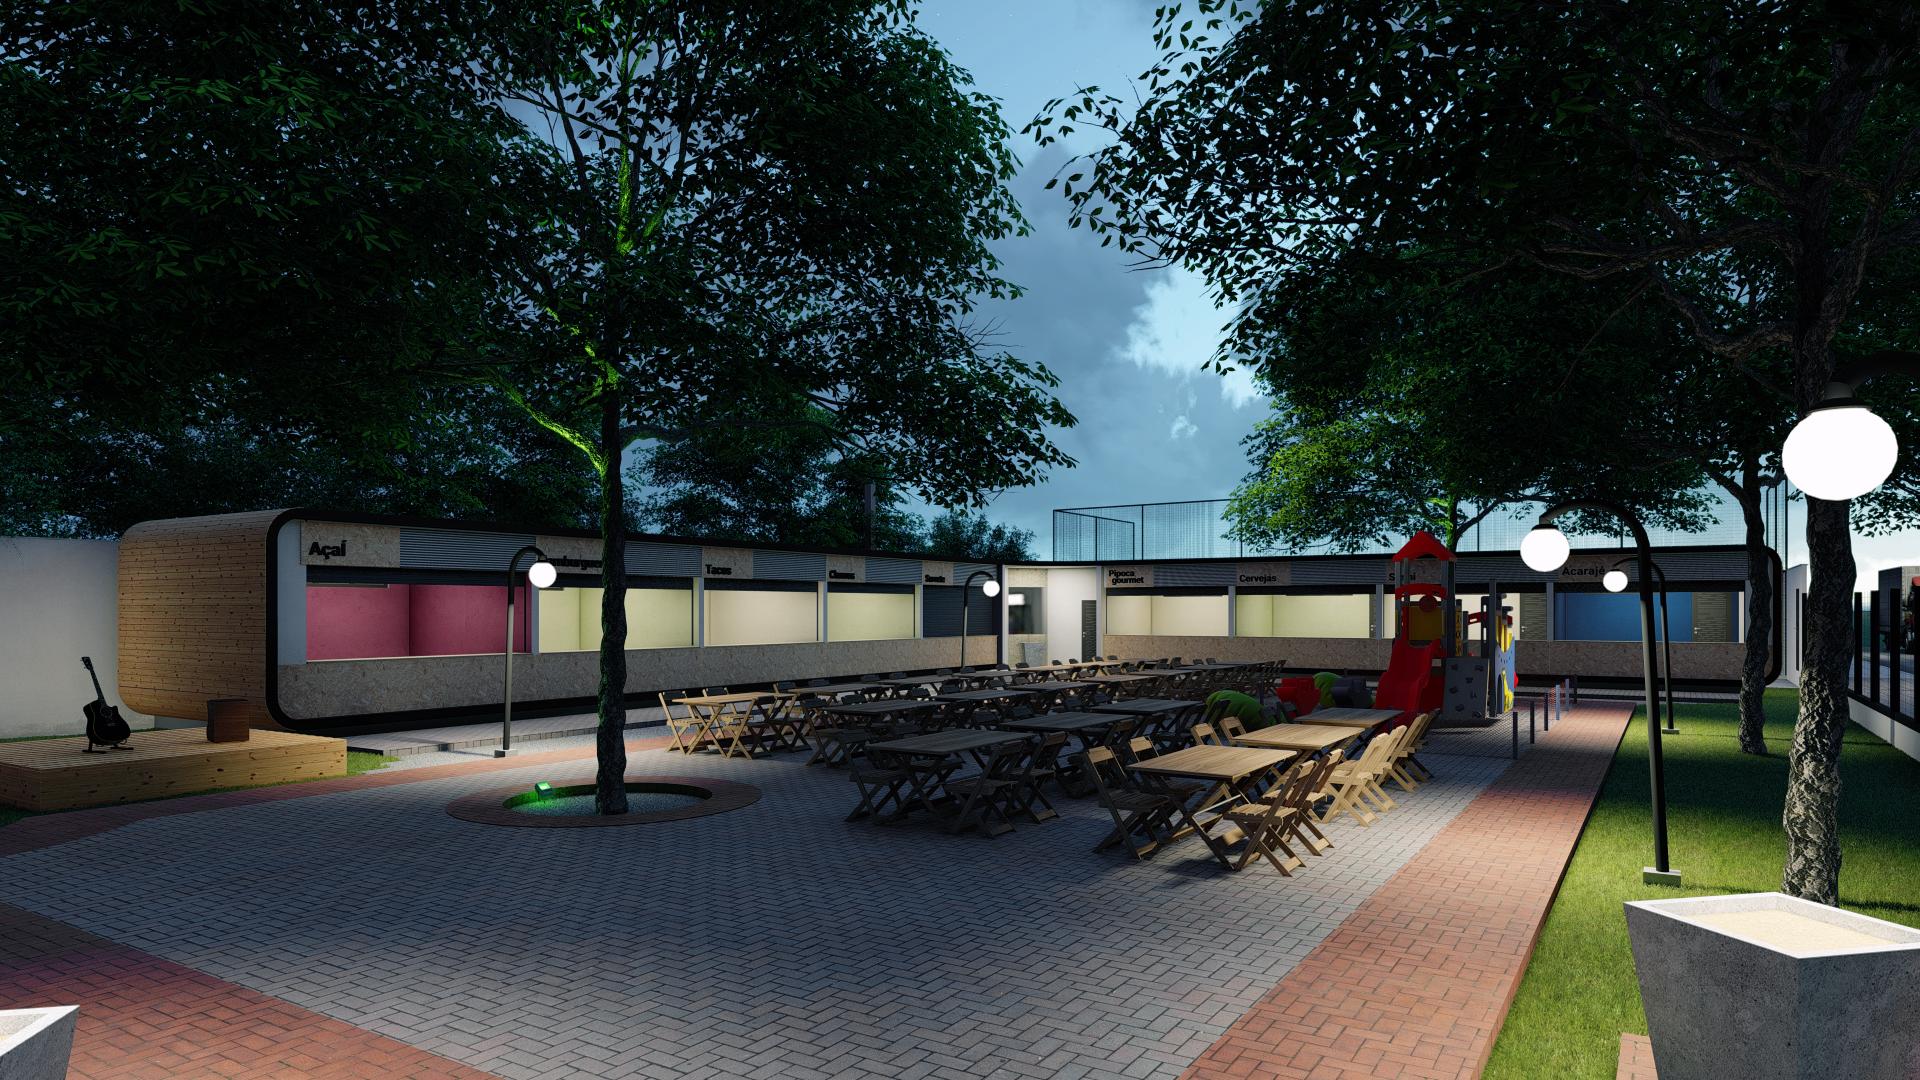 Foodpark - 02 Noite.png